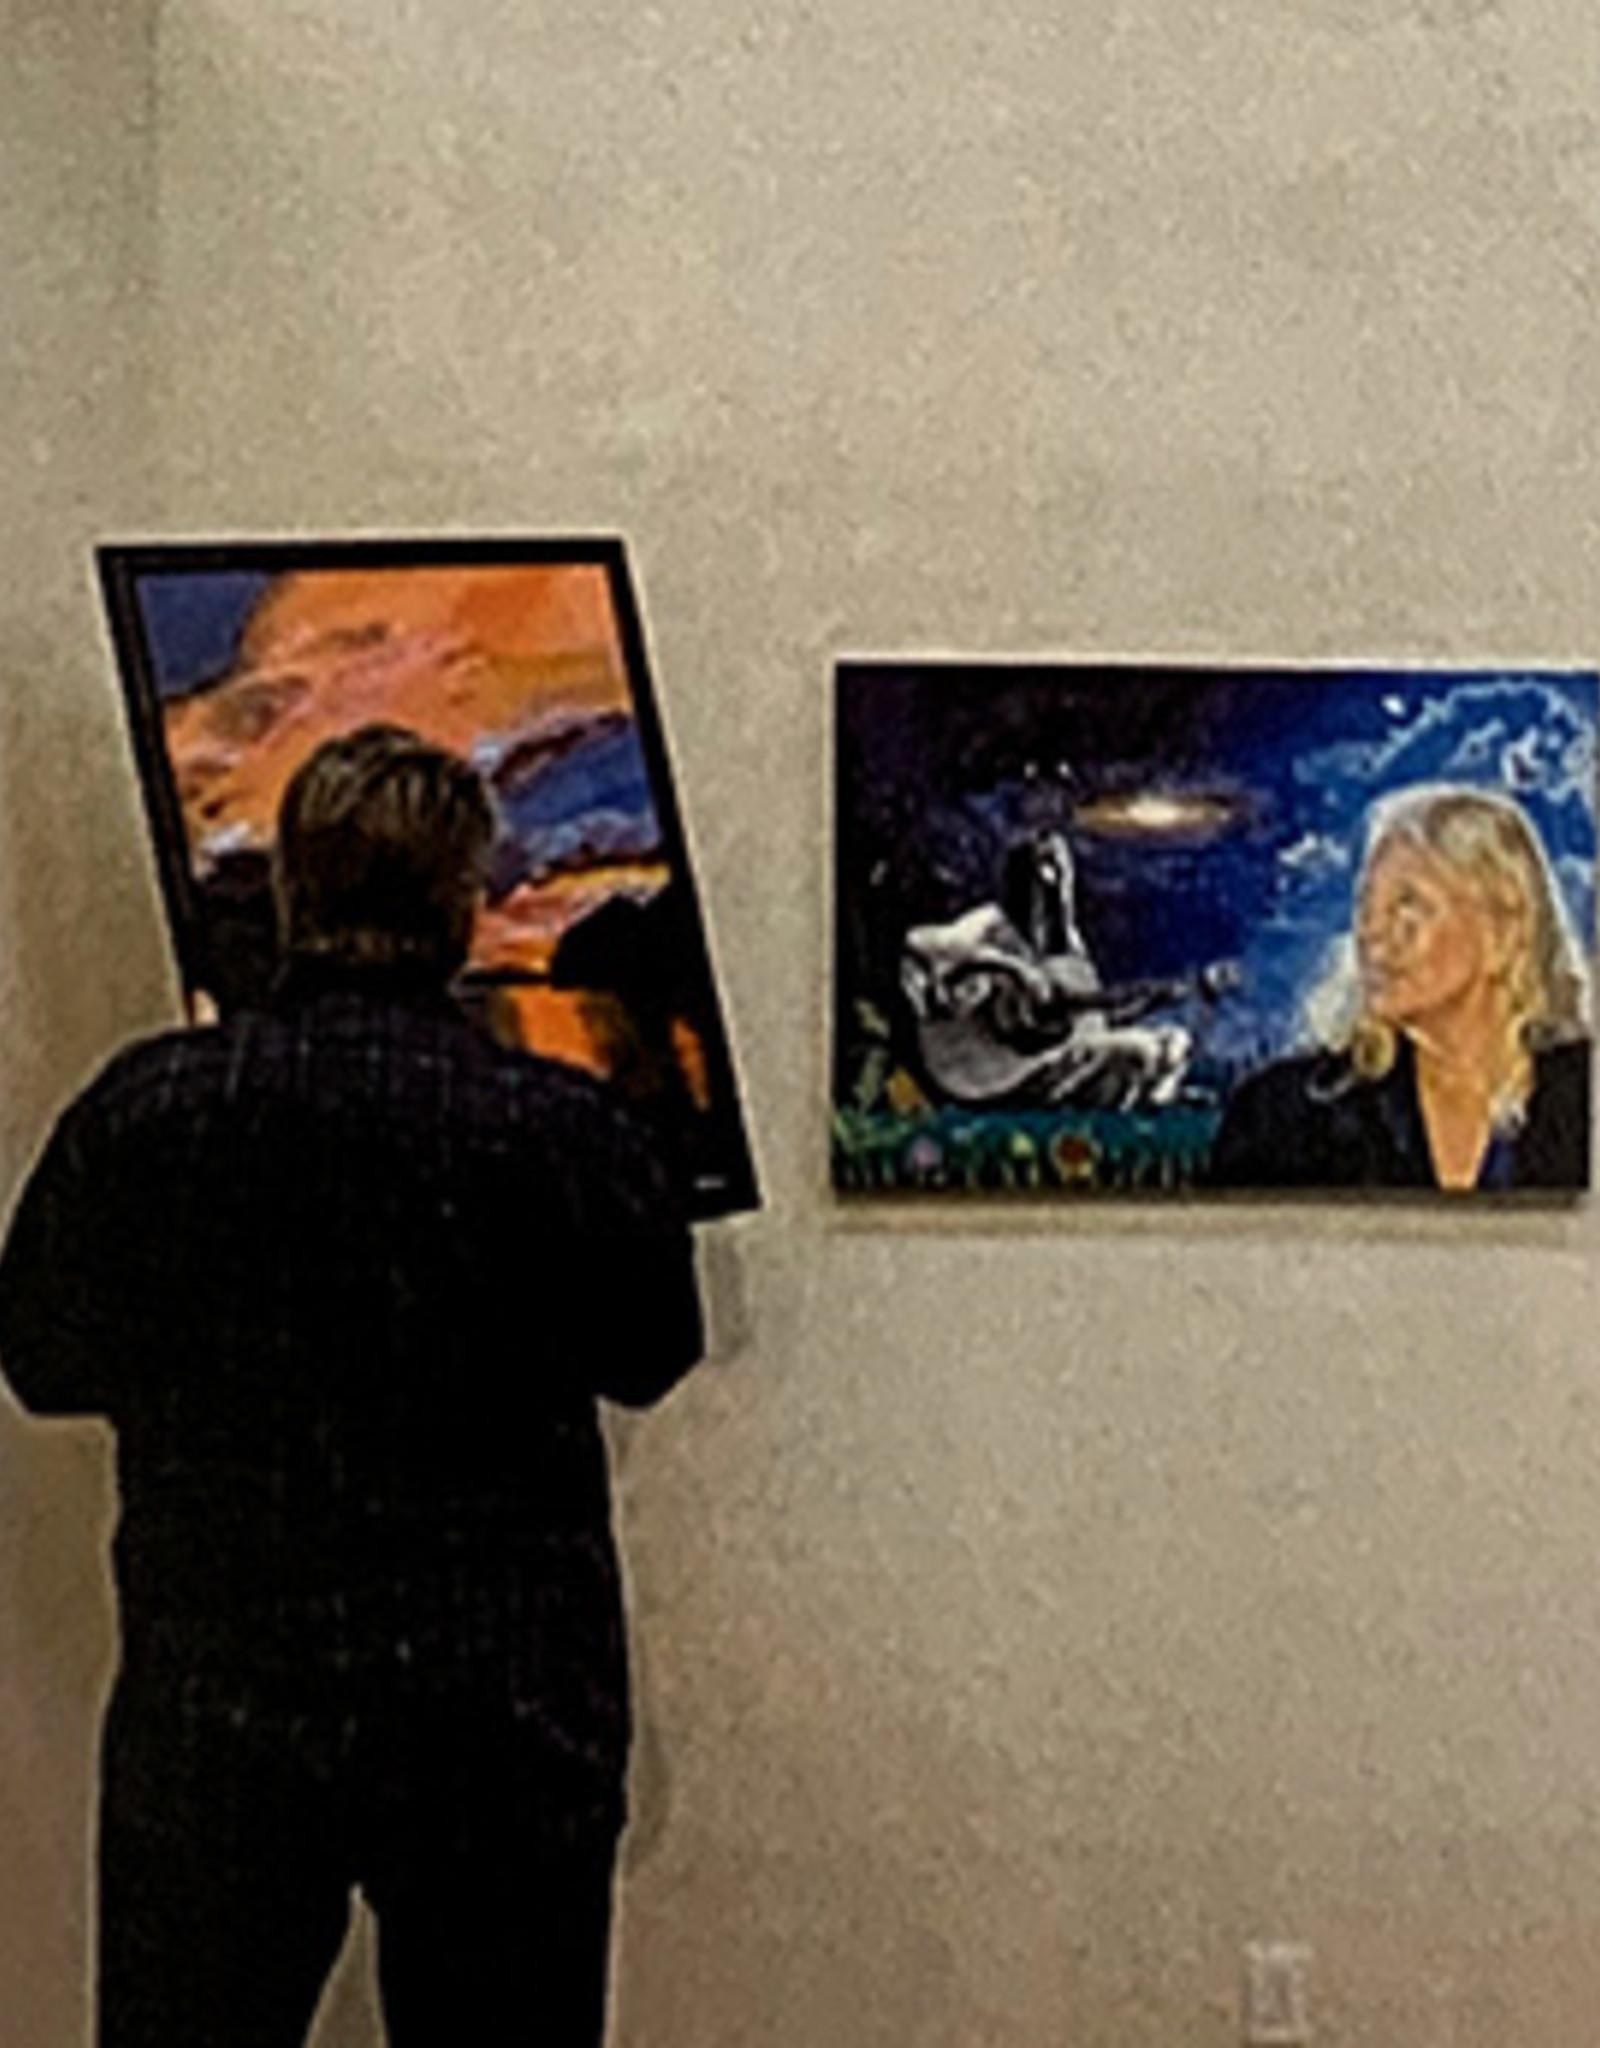 Full Wall Artist in Residence: Full Wall Rental